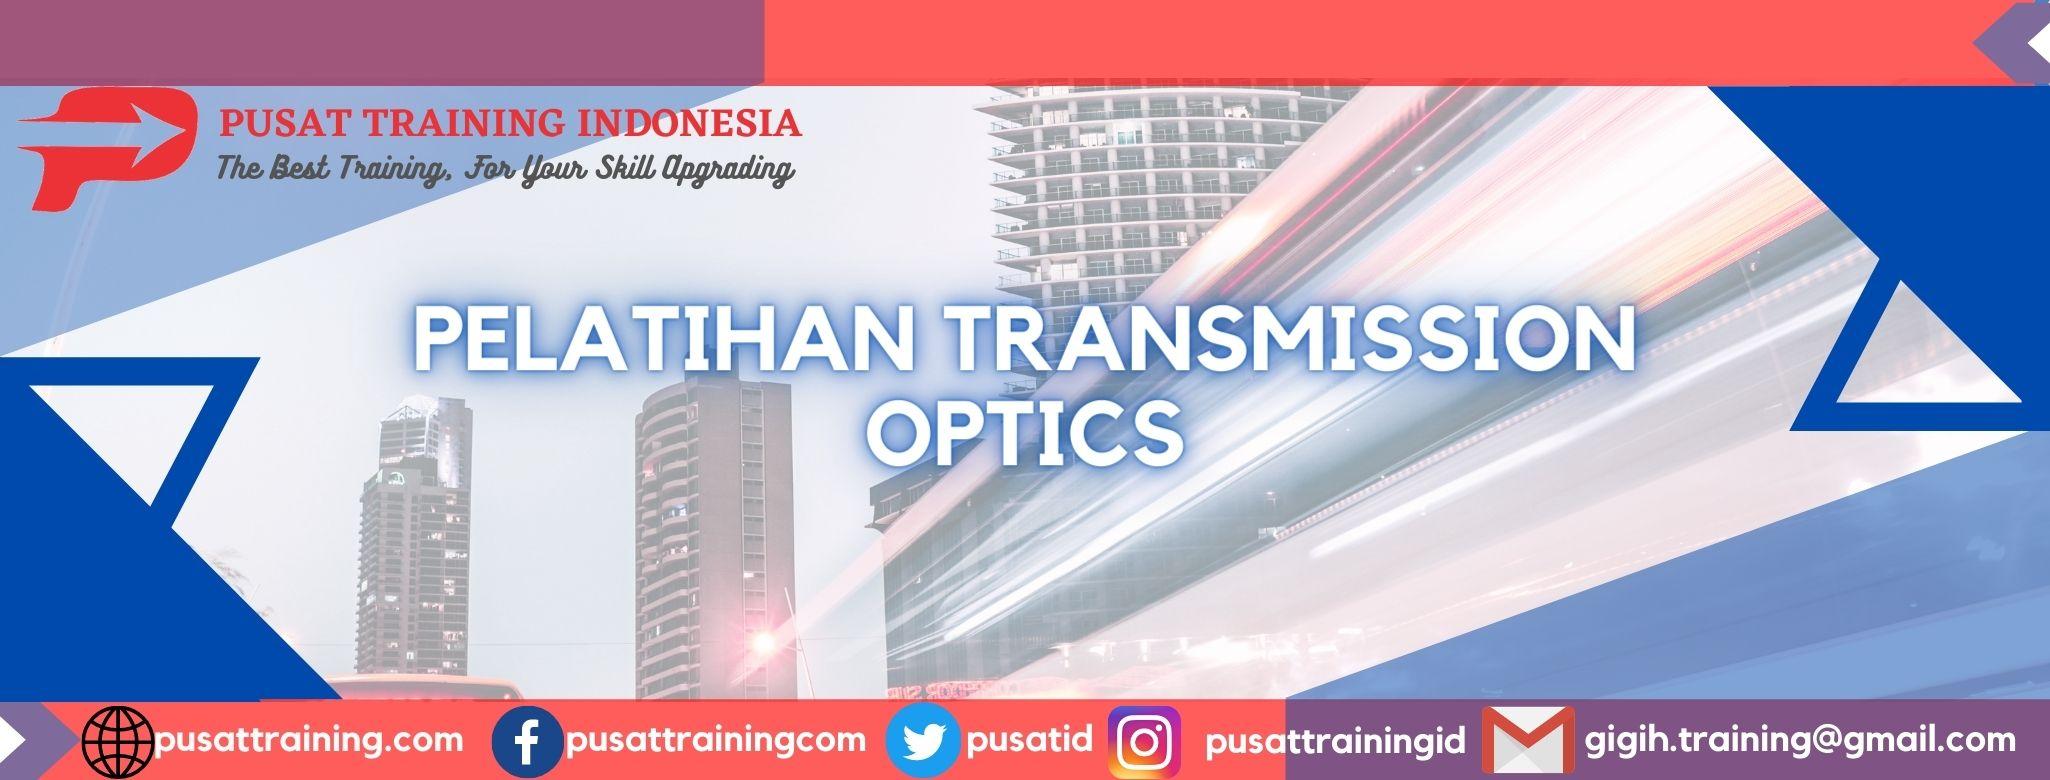 pelatihan-transmission-optics